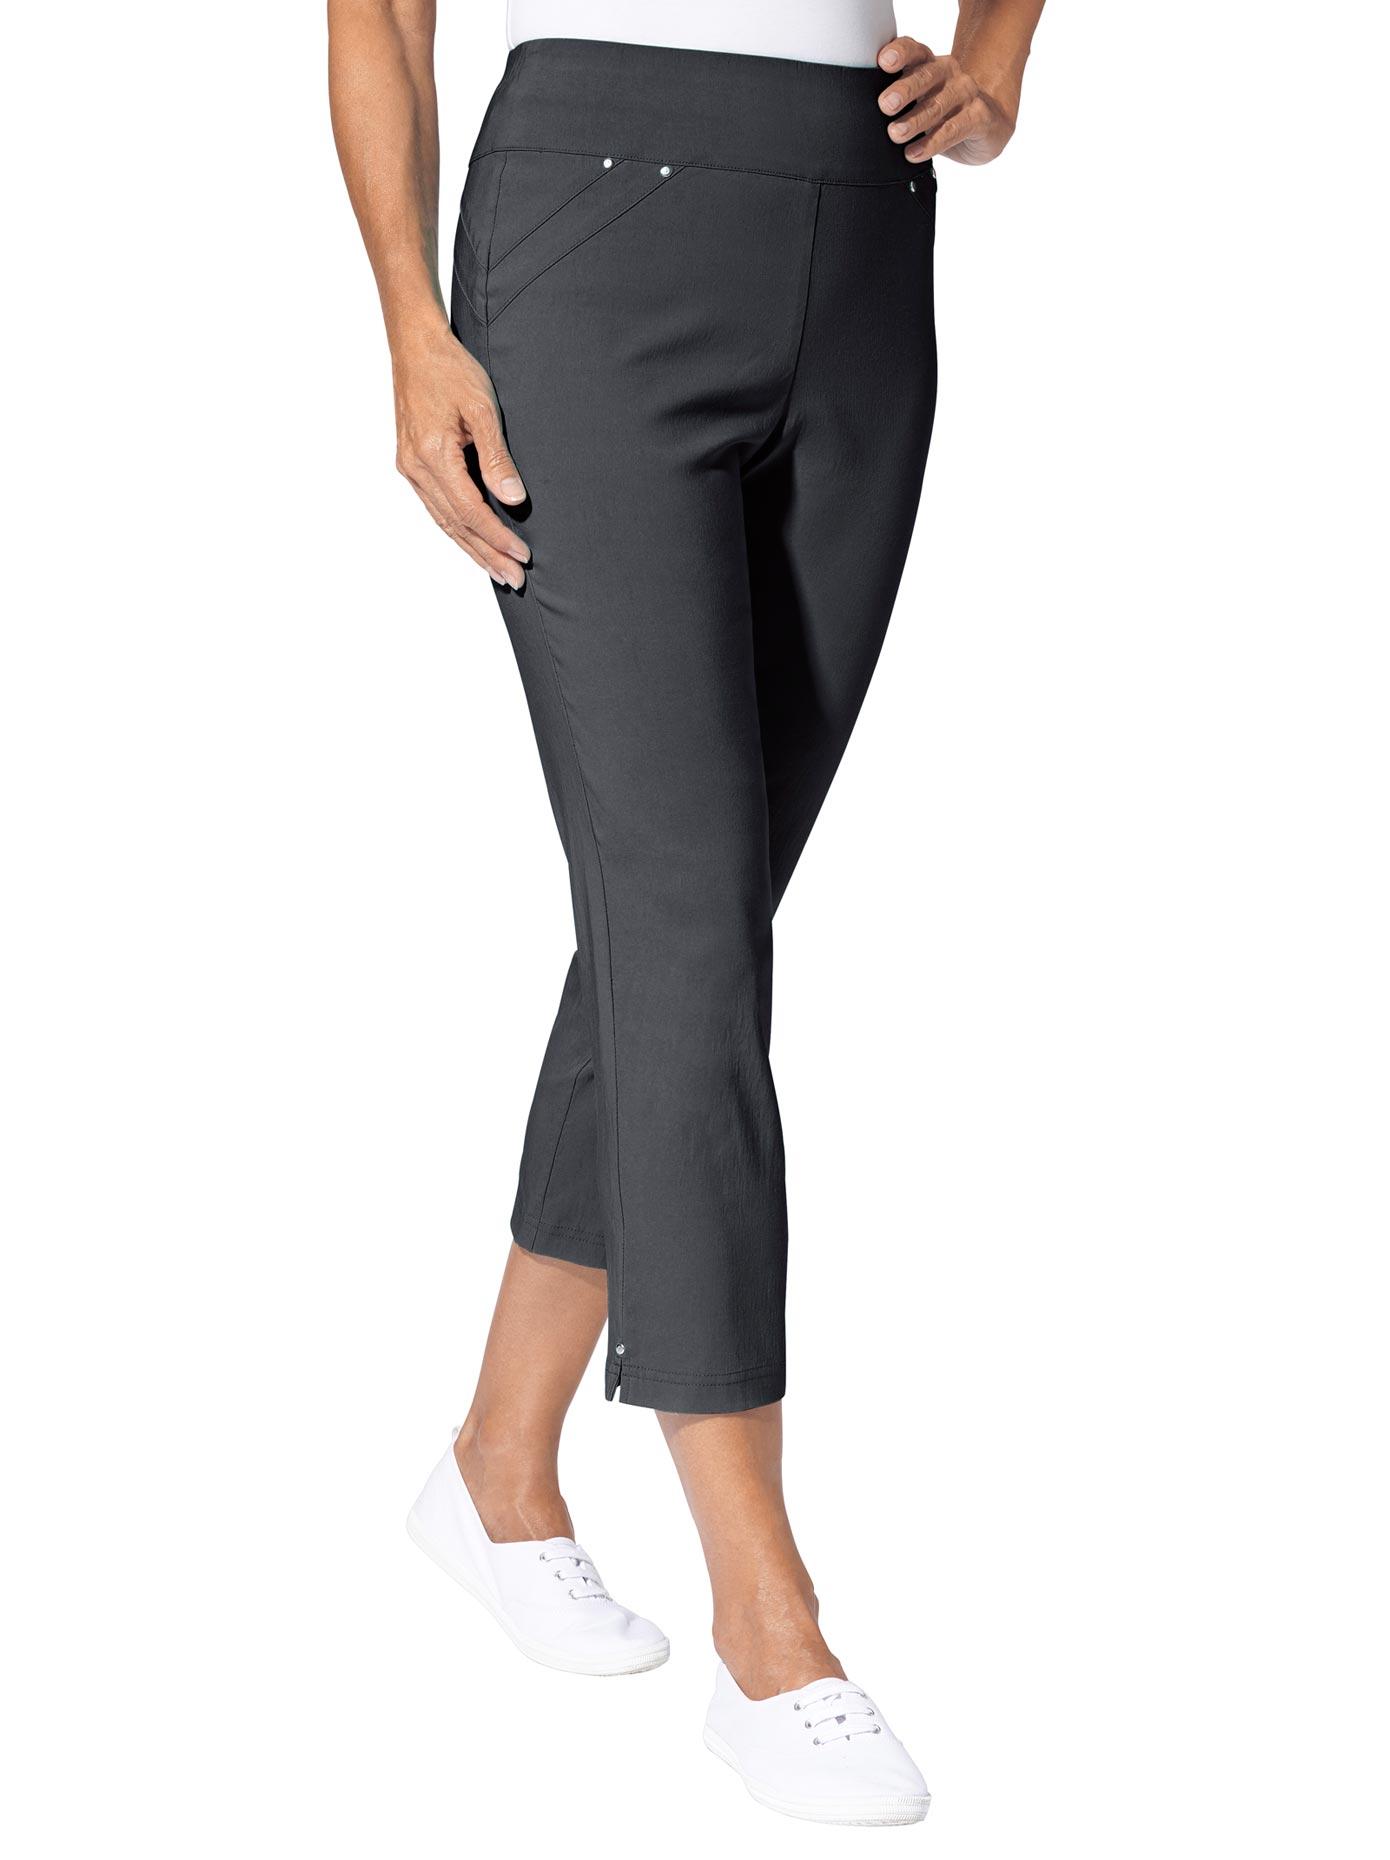 Classic Basics 7/8-Hose mit breitem Bund   Bekleidung > Hosen > 7/8-Hosen   Blau   Classic Basics